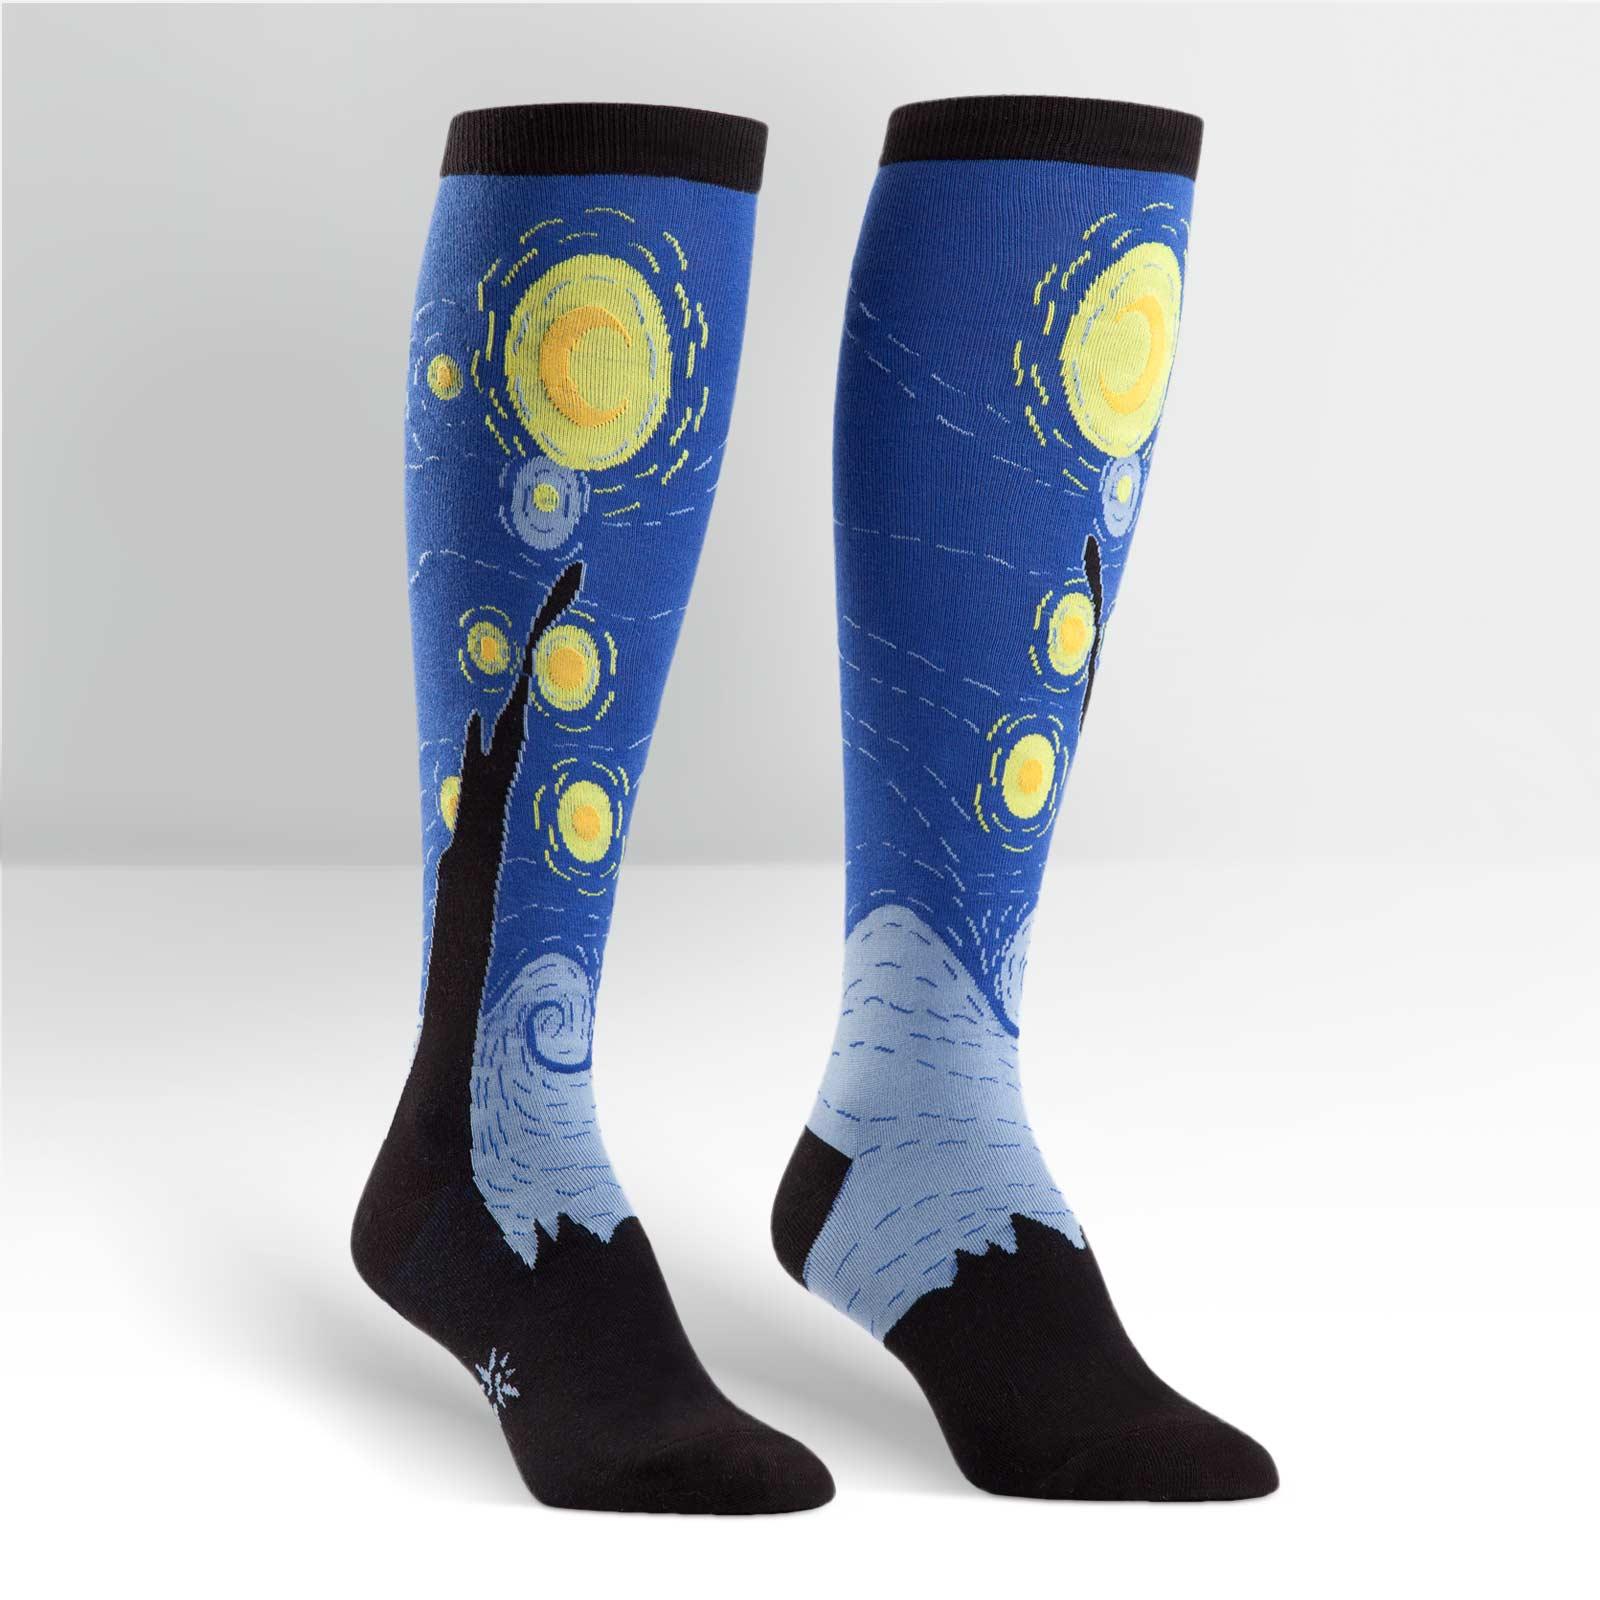 Sock Starry Night,F0121